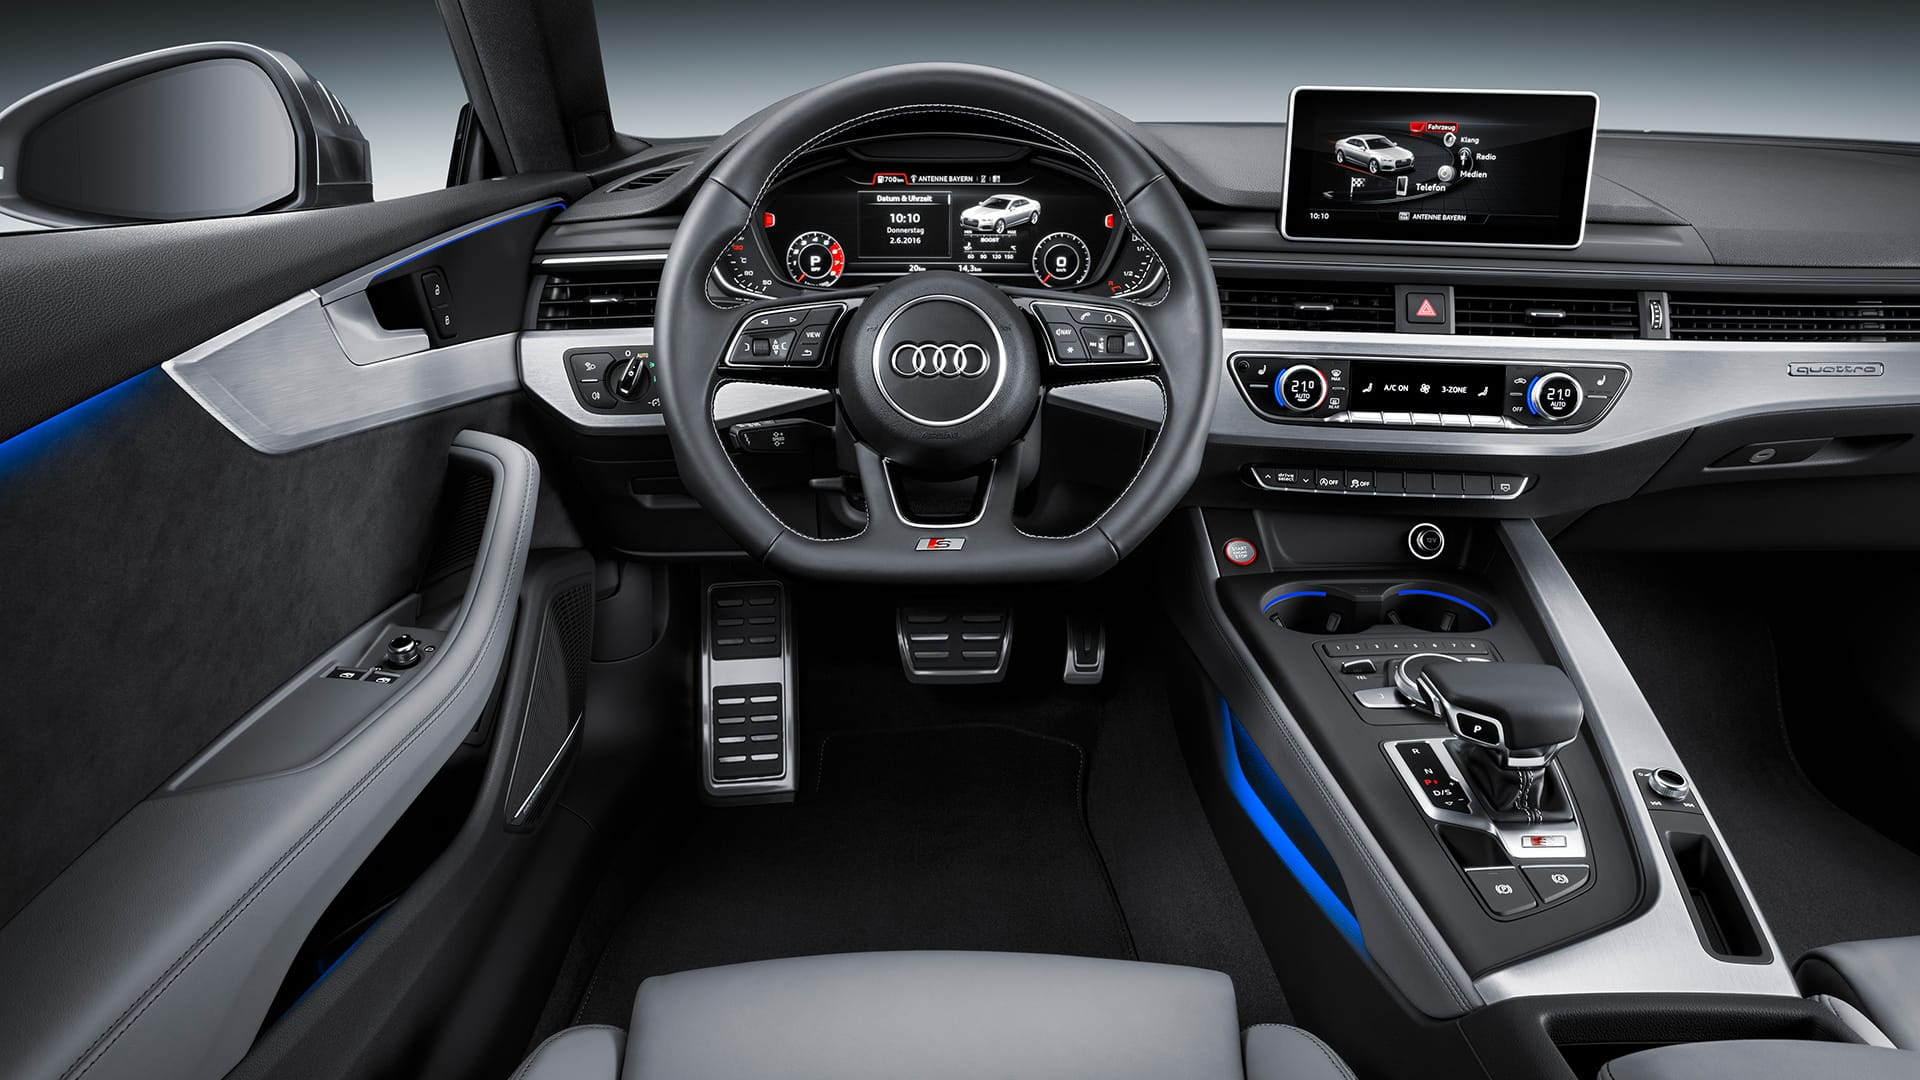 S5 Coupe A5 Audi Deutschland